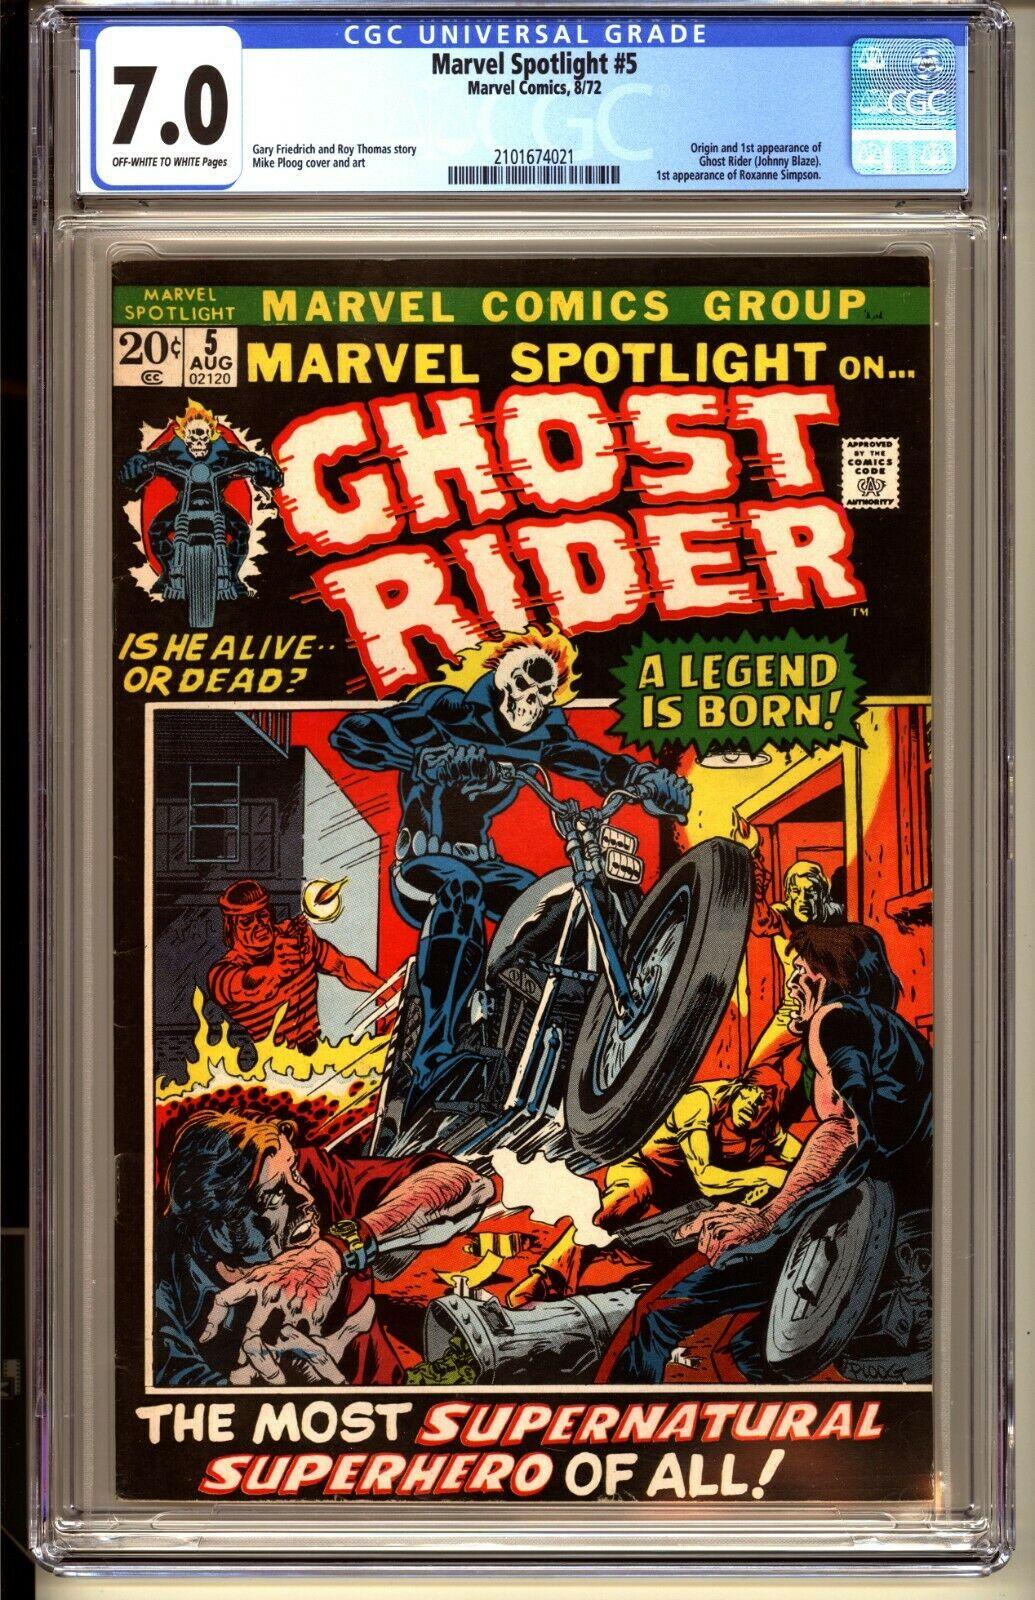 MARVEL SPOTLIGHT 5  CGC 70 OWW FNVF  Marvel Comics 1972  1st app GHOST RIDER